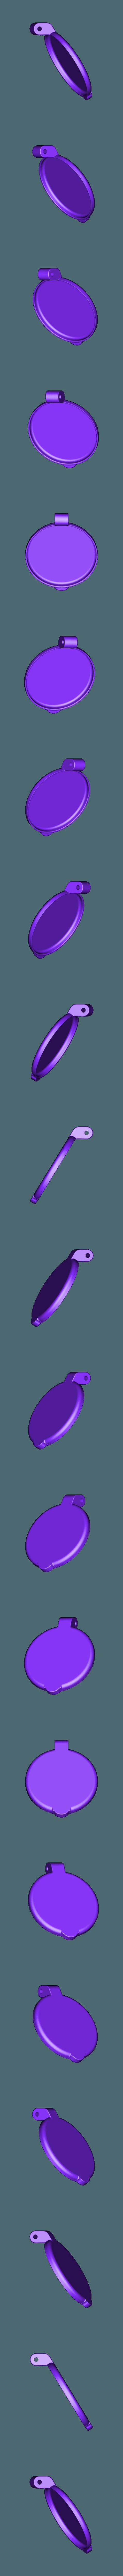 winchester hopper CAP.STL Download STL file 50 rounds Winchester Hopper • 3D printable object, DjeKlein